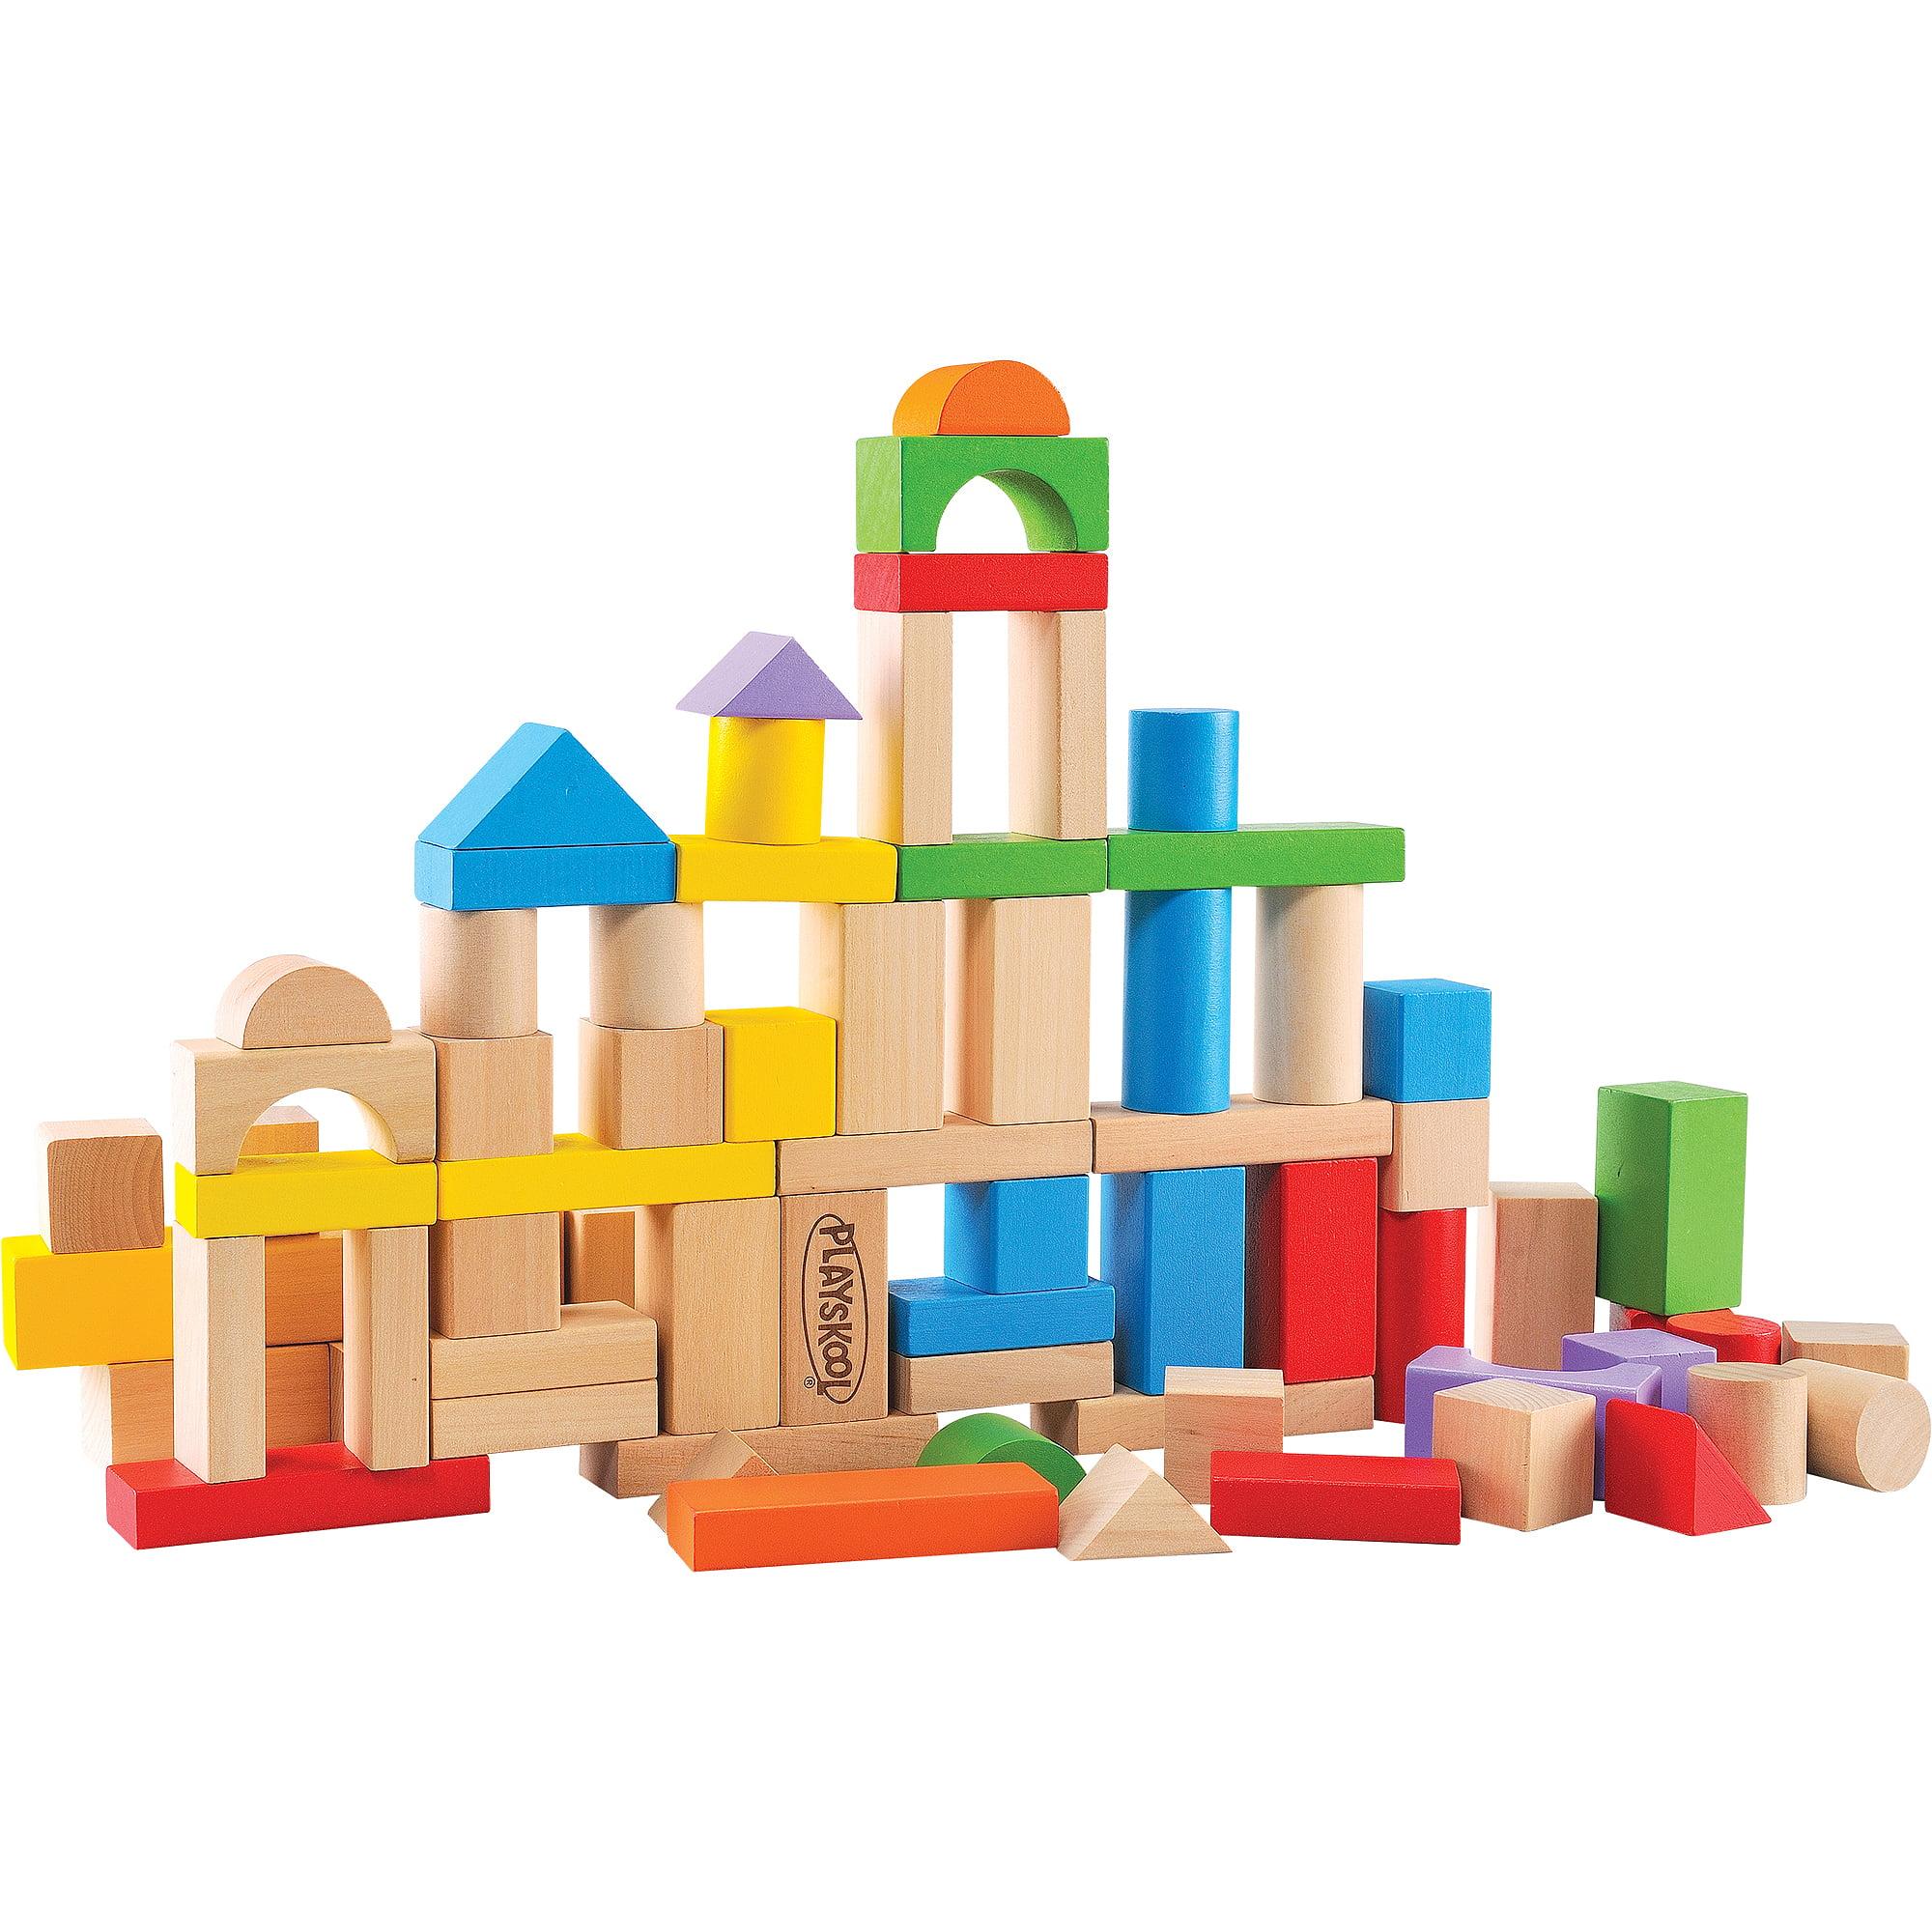 Playskool 80 Piece Wooden Building Blocks Walmart Com